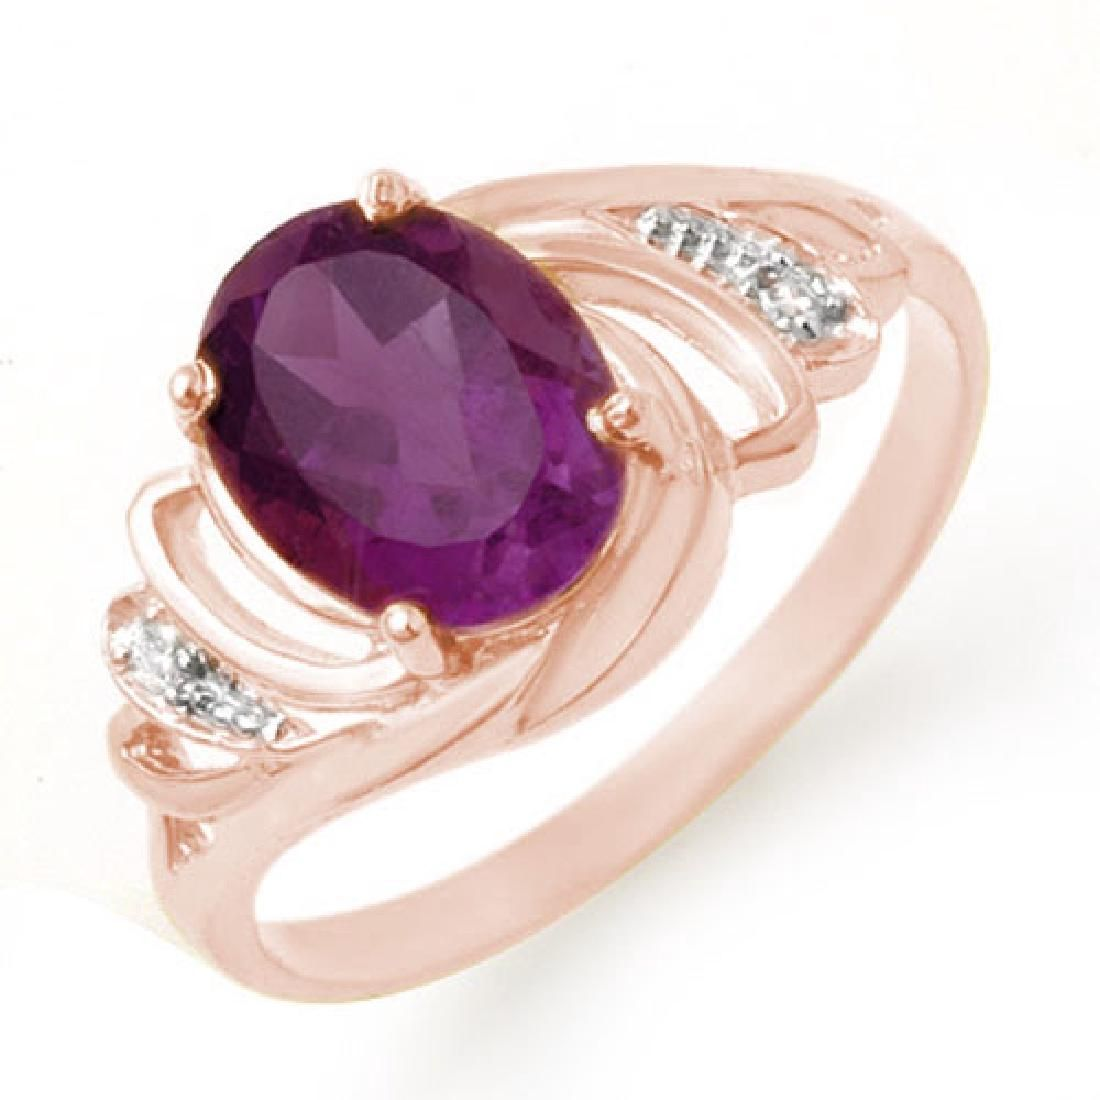 148 CTW Amethyst Diamond Ring 14K Rose Gold